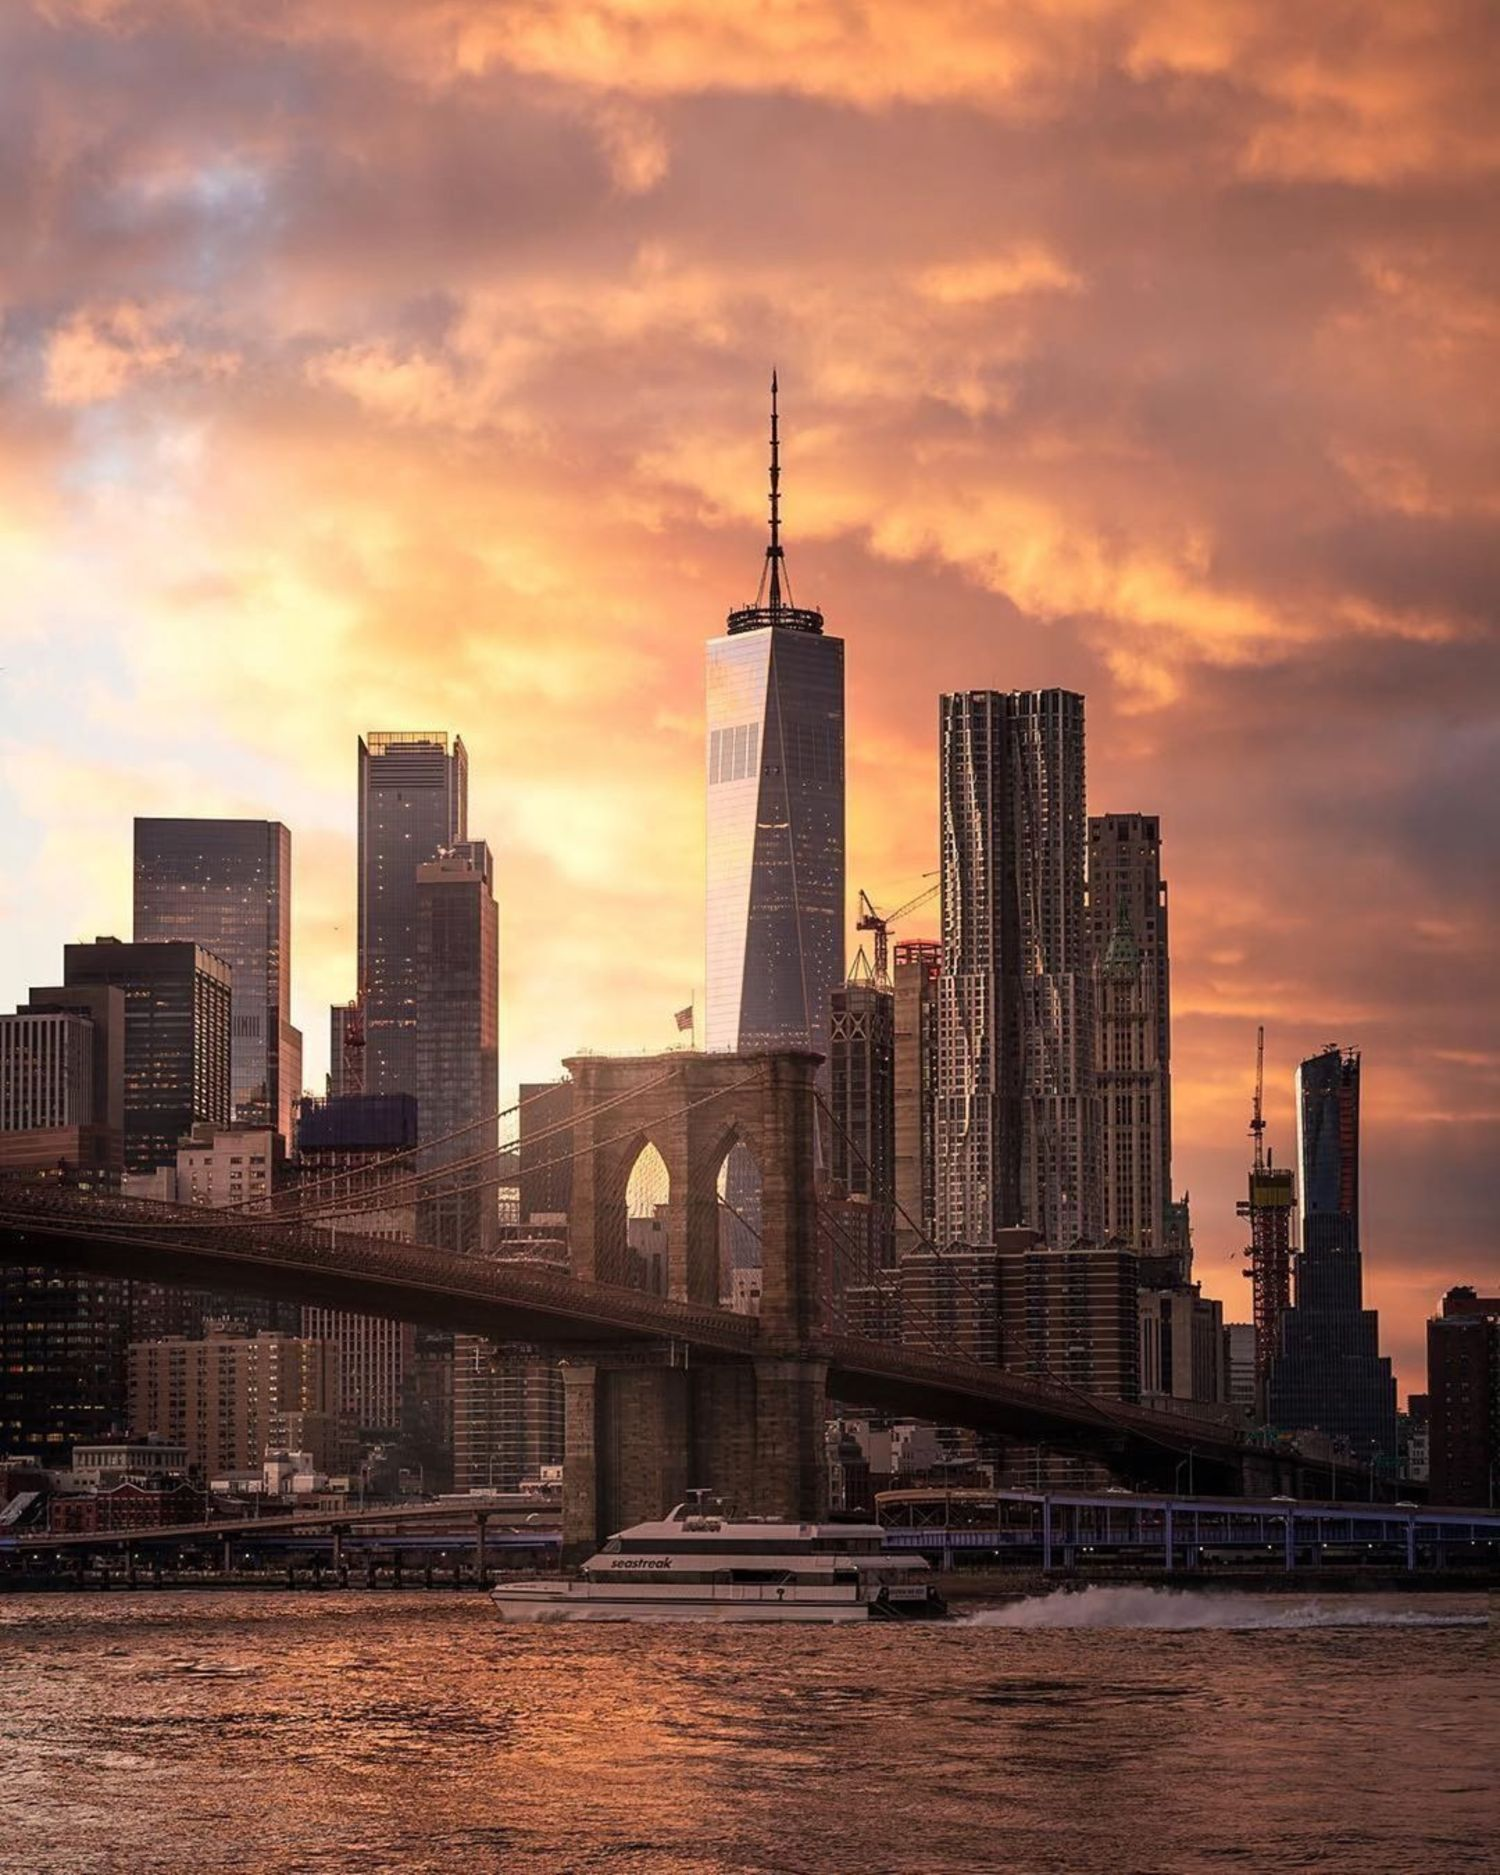 New York, New York. Photo via @zura.nyc #viewingnyc #nyc #newyork #newyorkcity #sunset #brooklynbridge #brooklynbridgepark